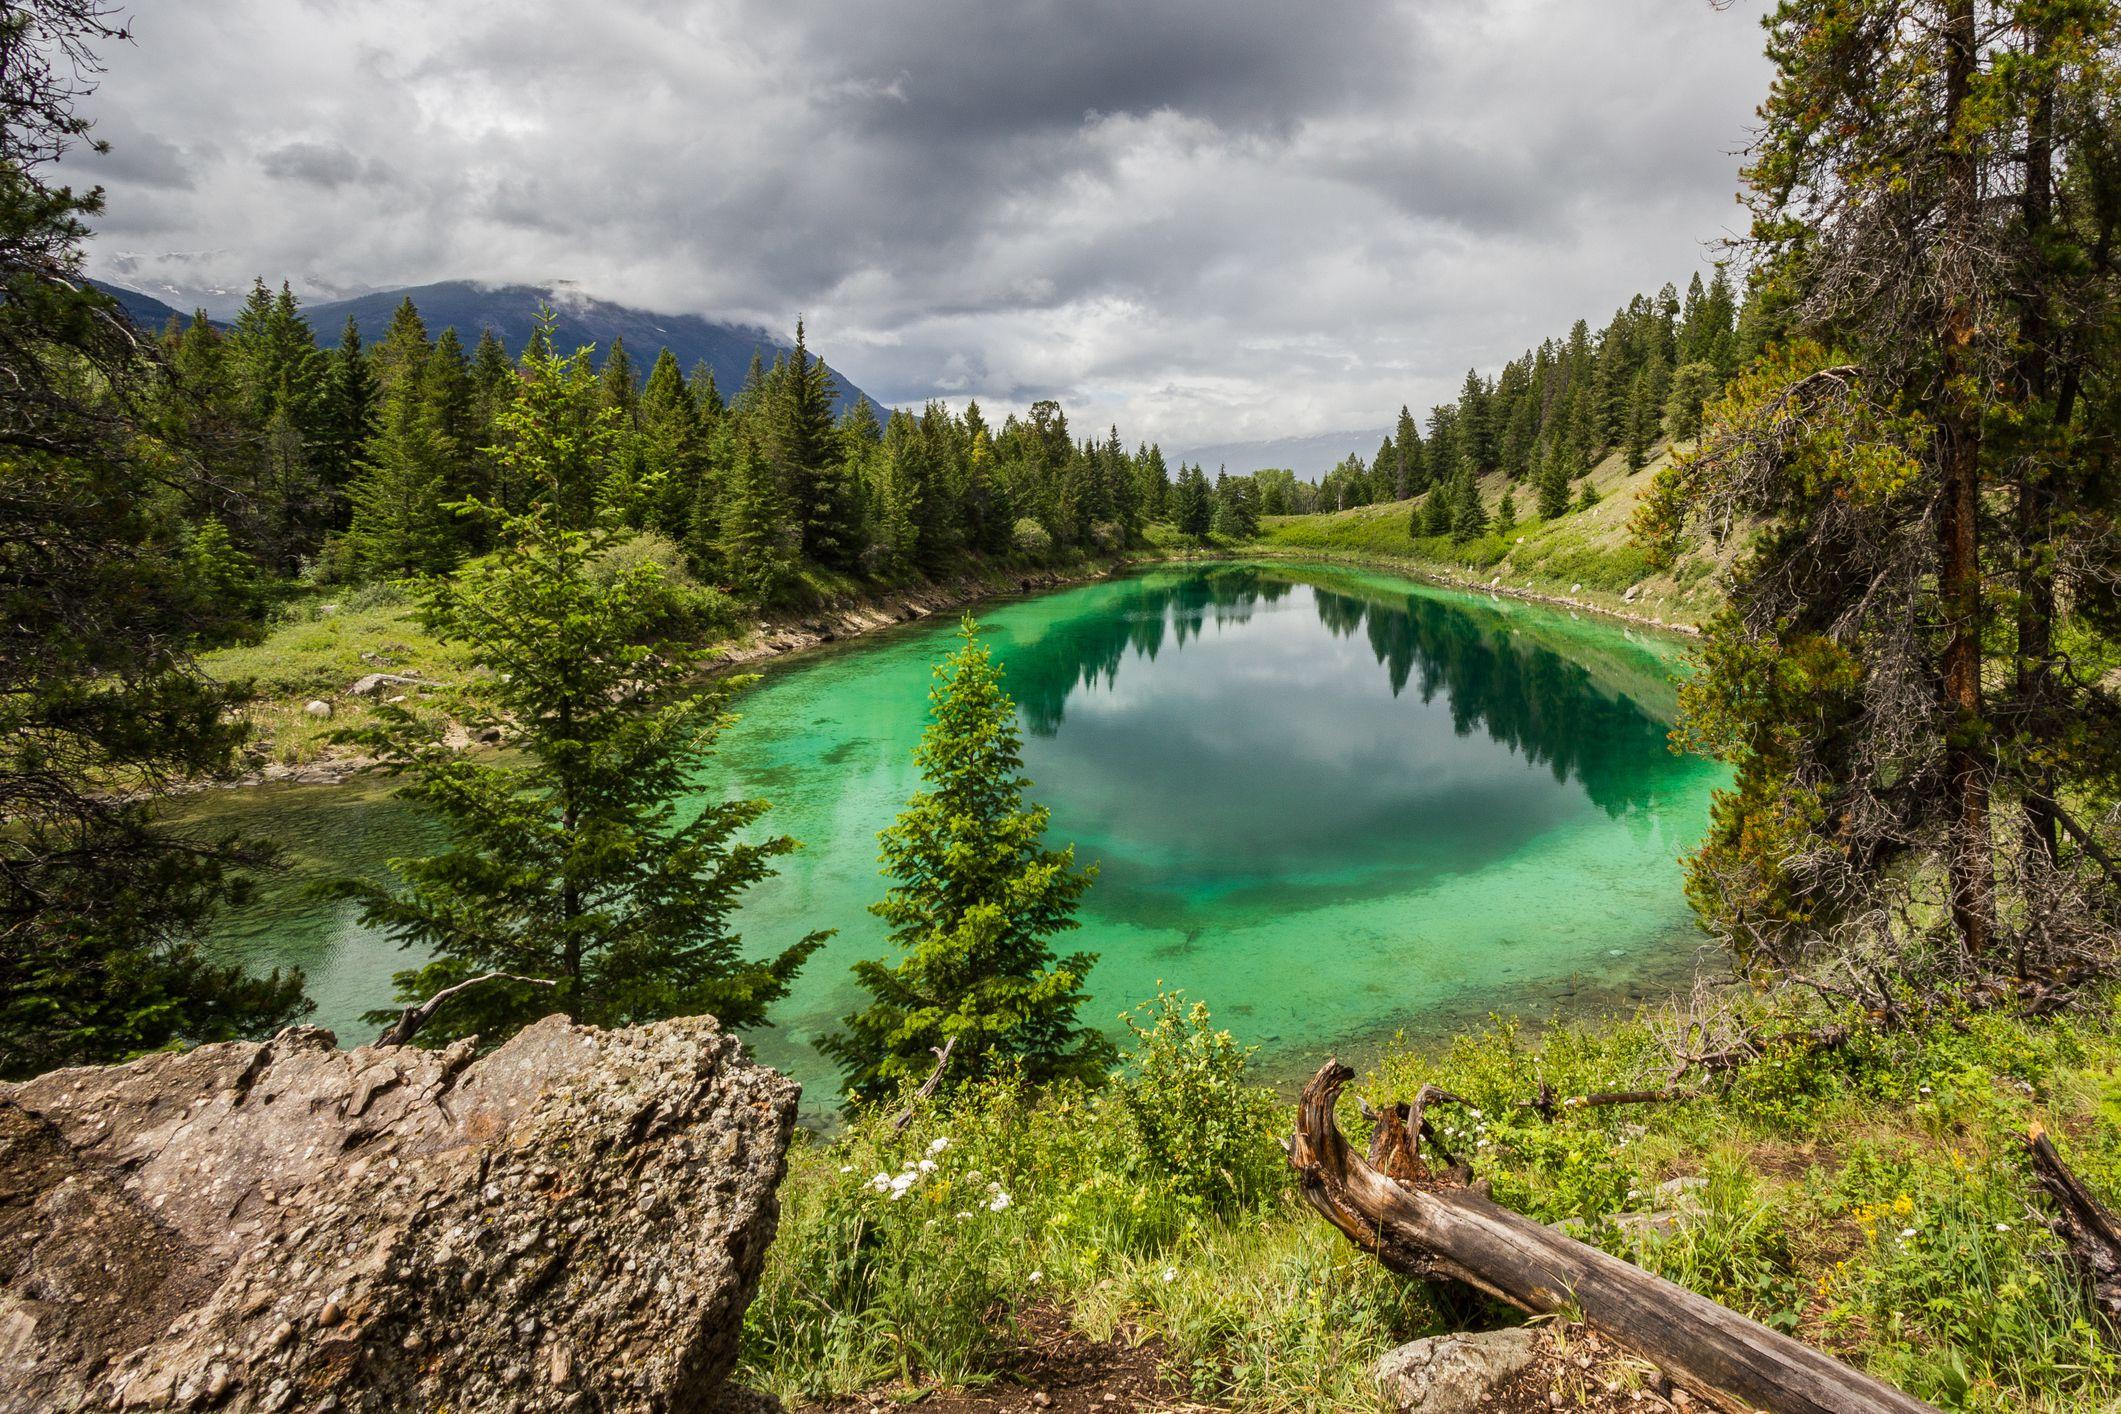 Average Car Insurance >> Visit Gorgeous Canadian National Parks Near the U.S. Border